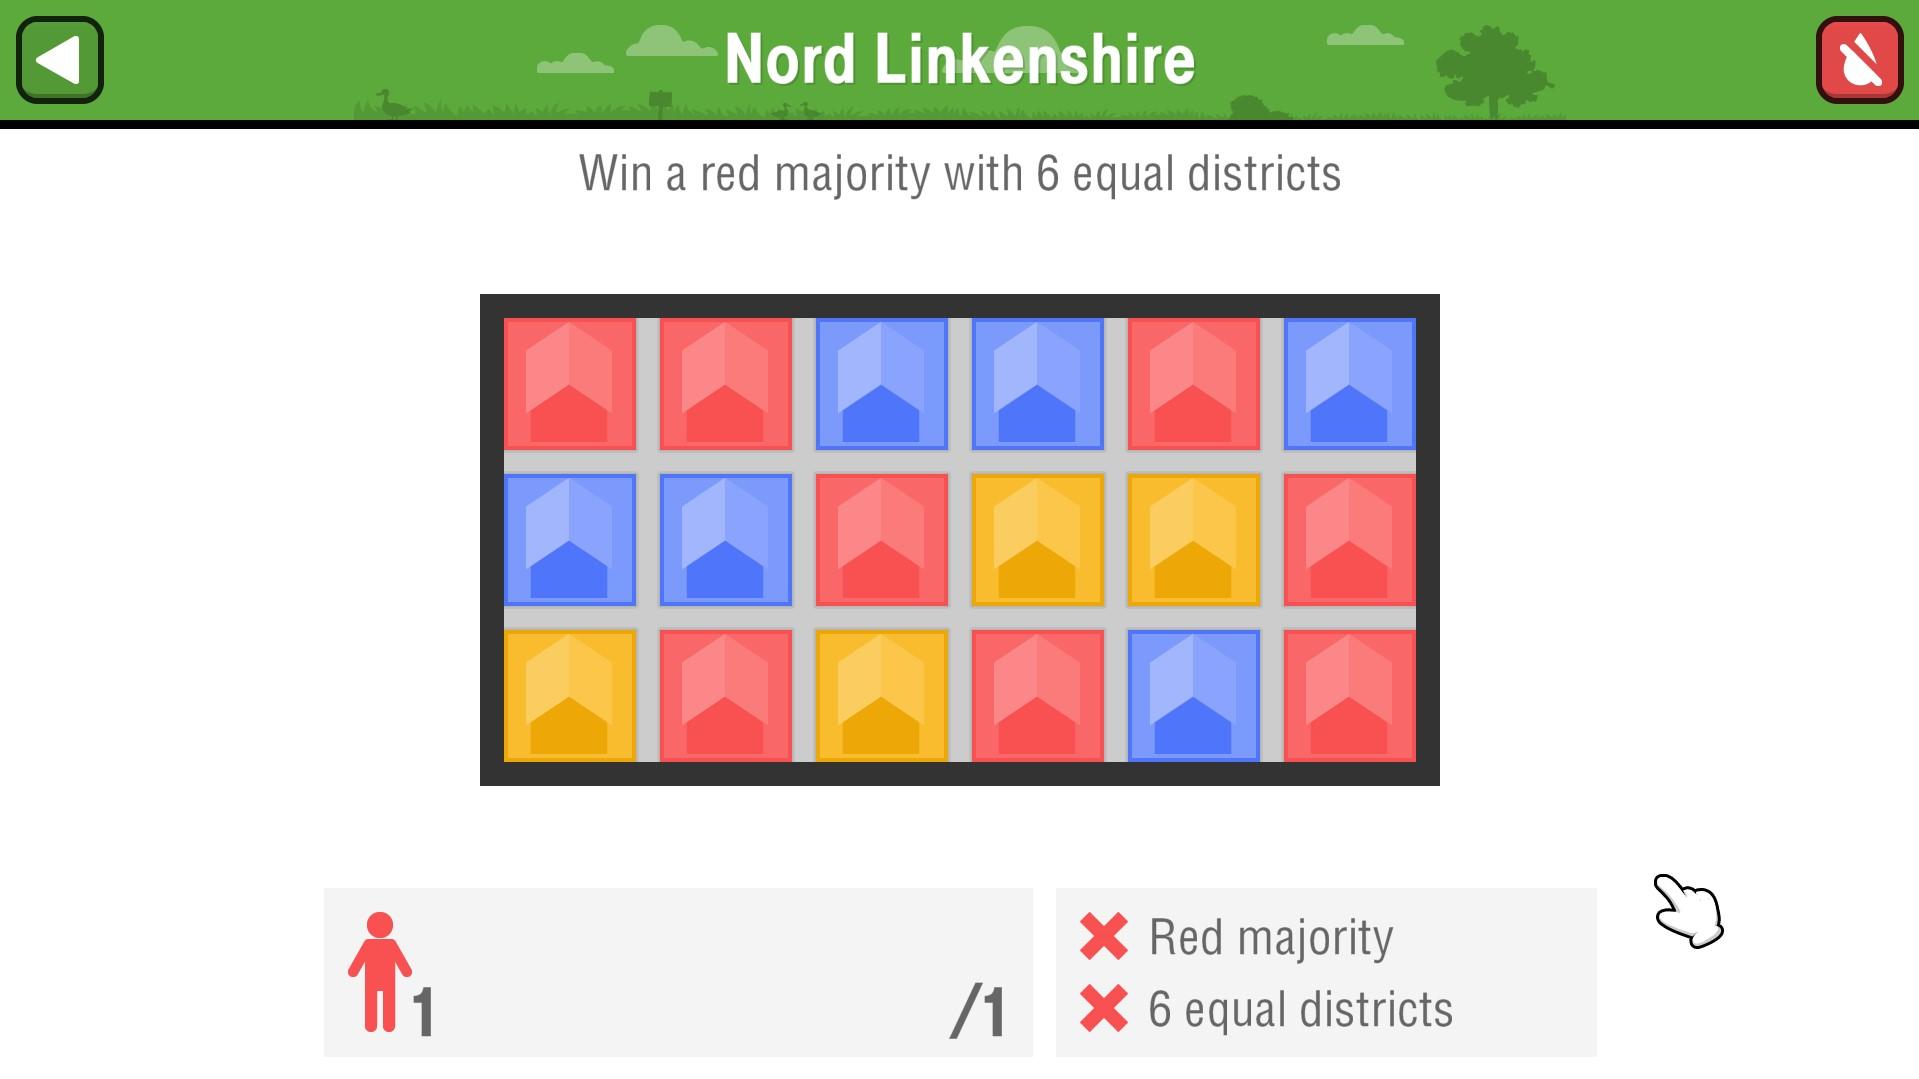 Nord Linkenshire